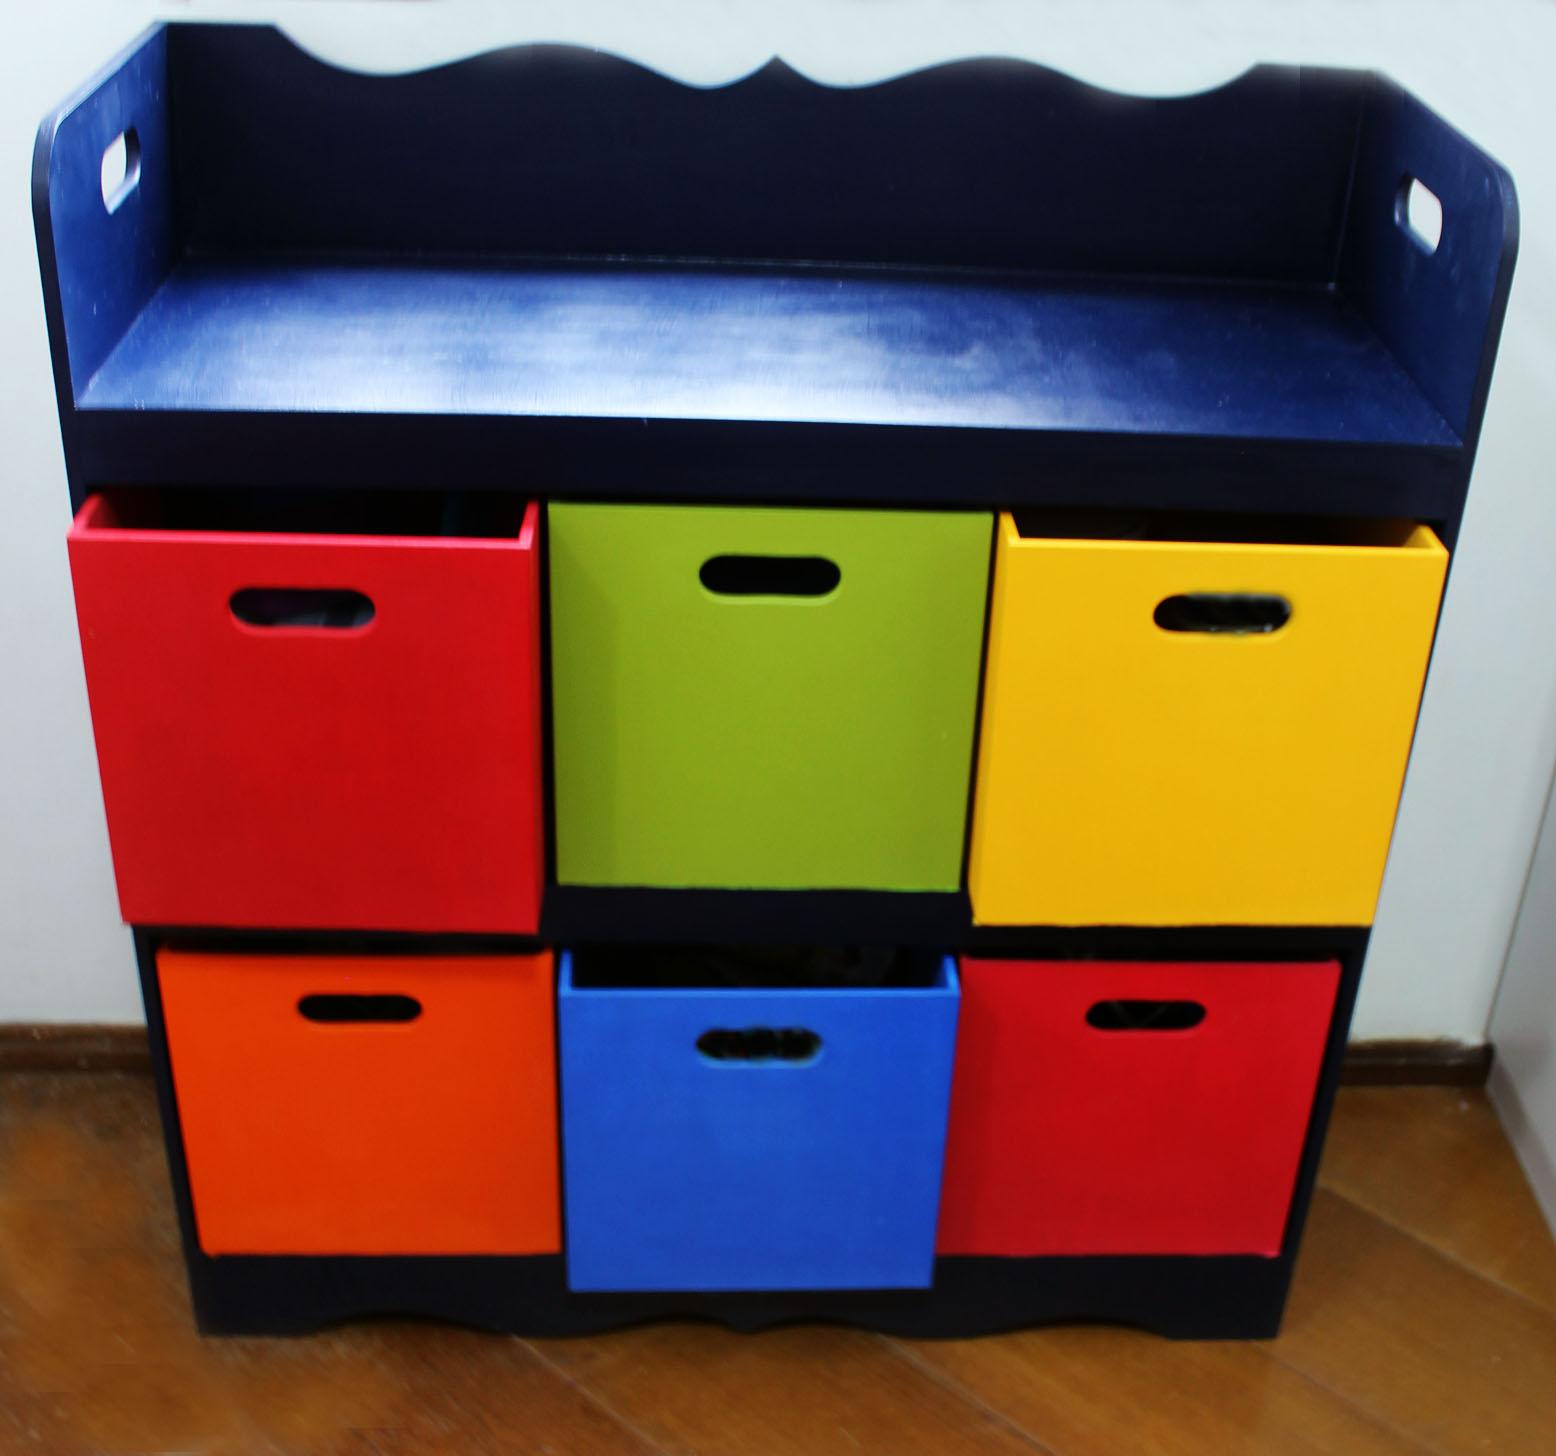 Artesanato Ouro Preto Minas Gerais ~ Organizador de brinquedos Ateli u00ea Serena Arte Elo7